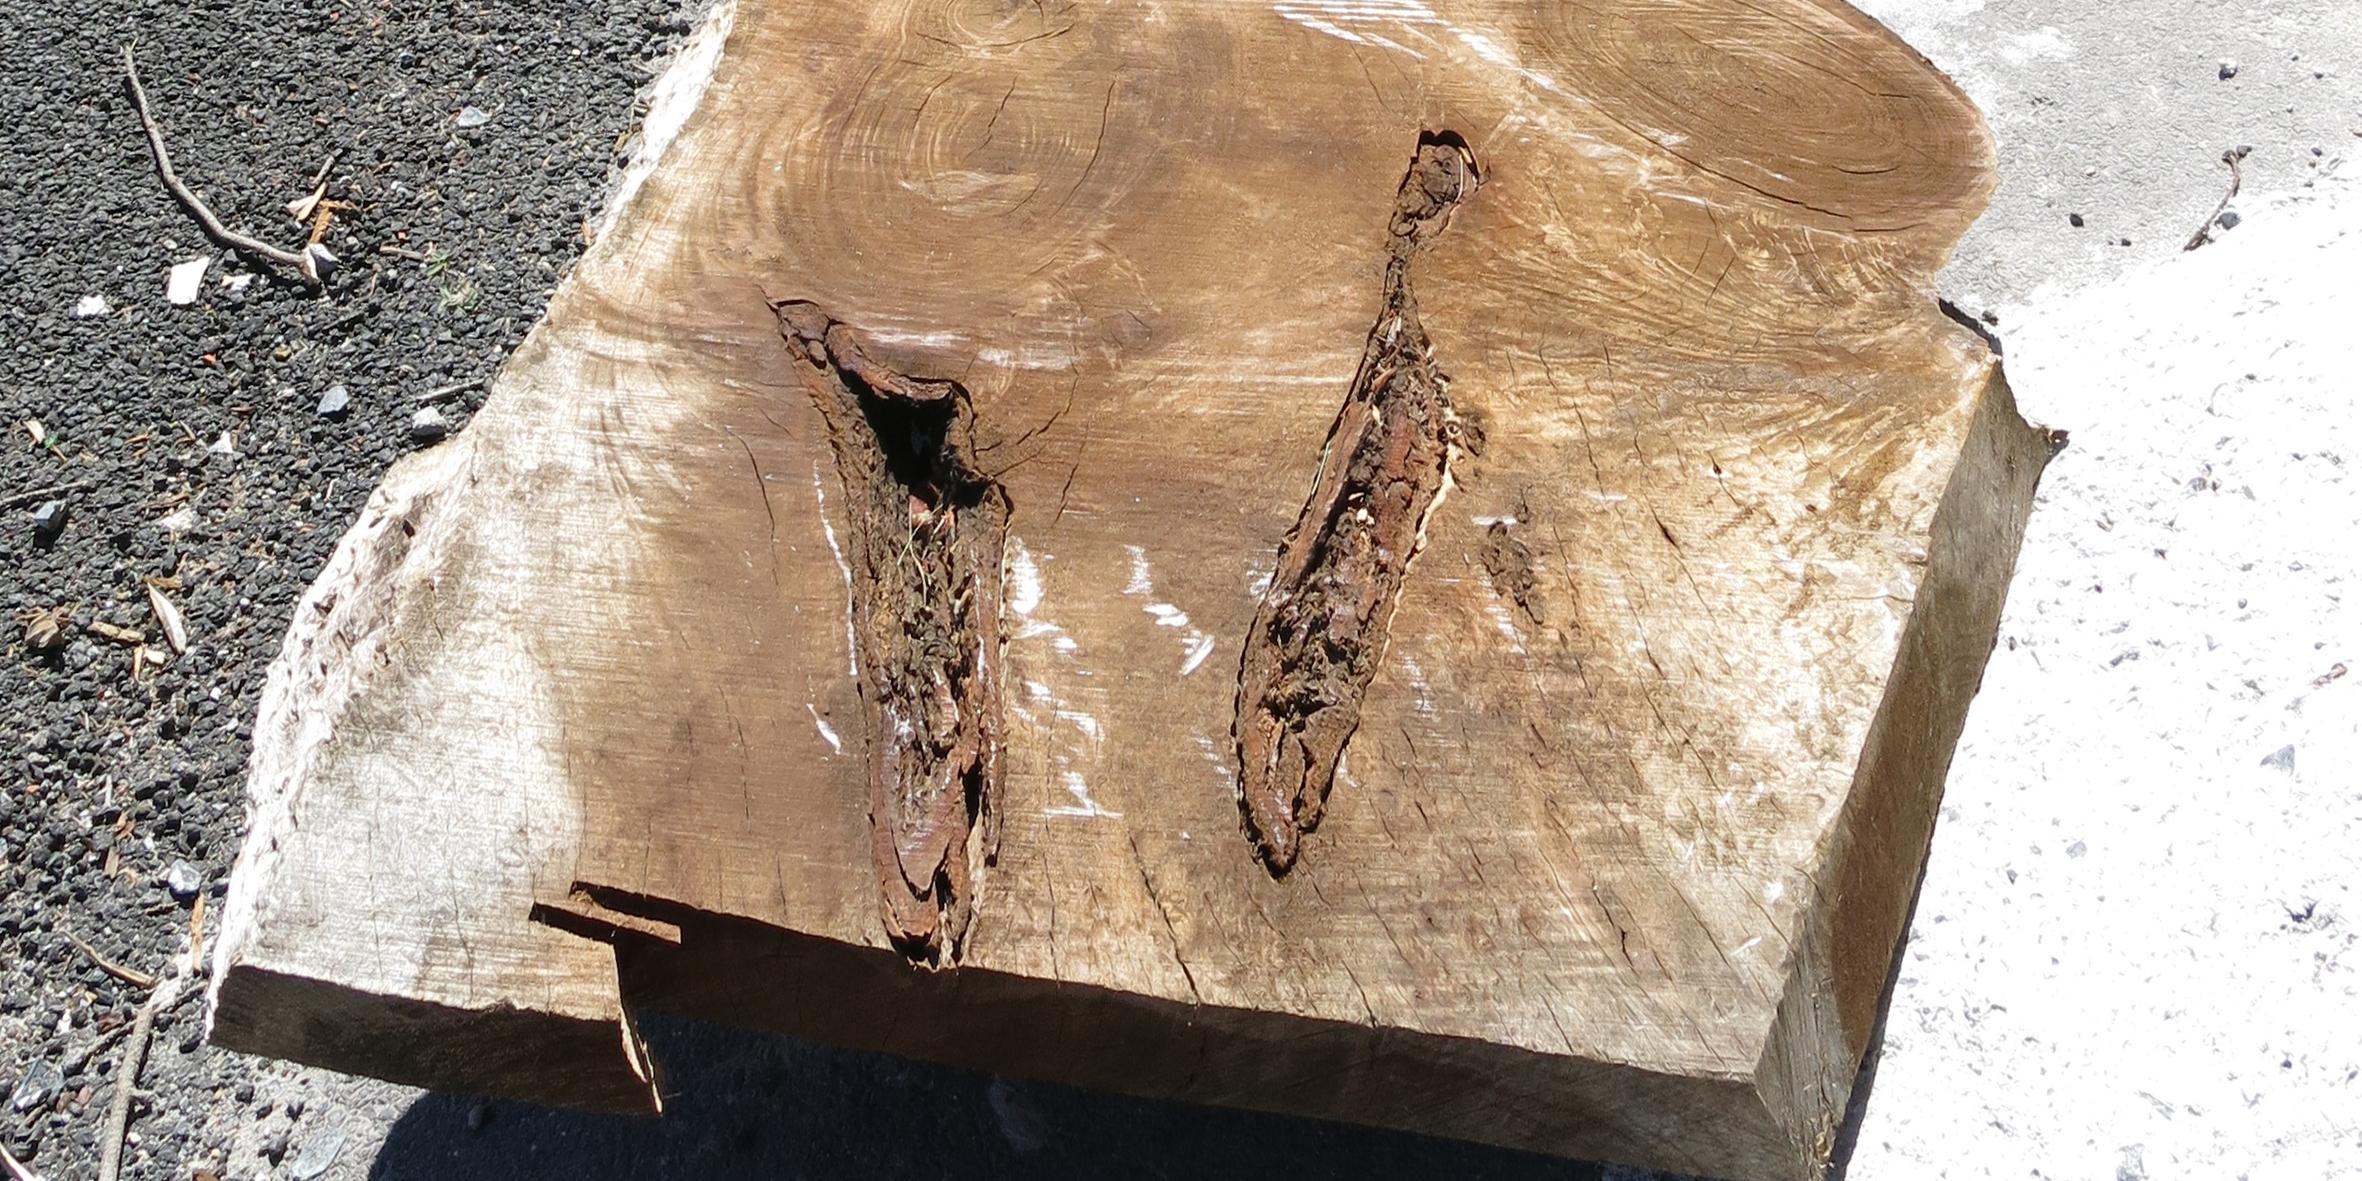 blackwood slab, approximate dimensions 5100 l x 850 w x 70 d